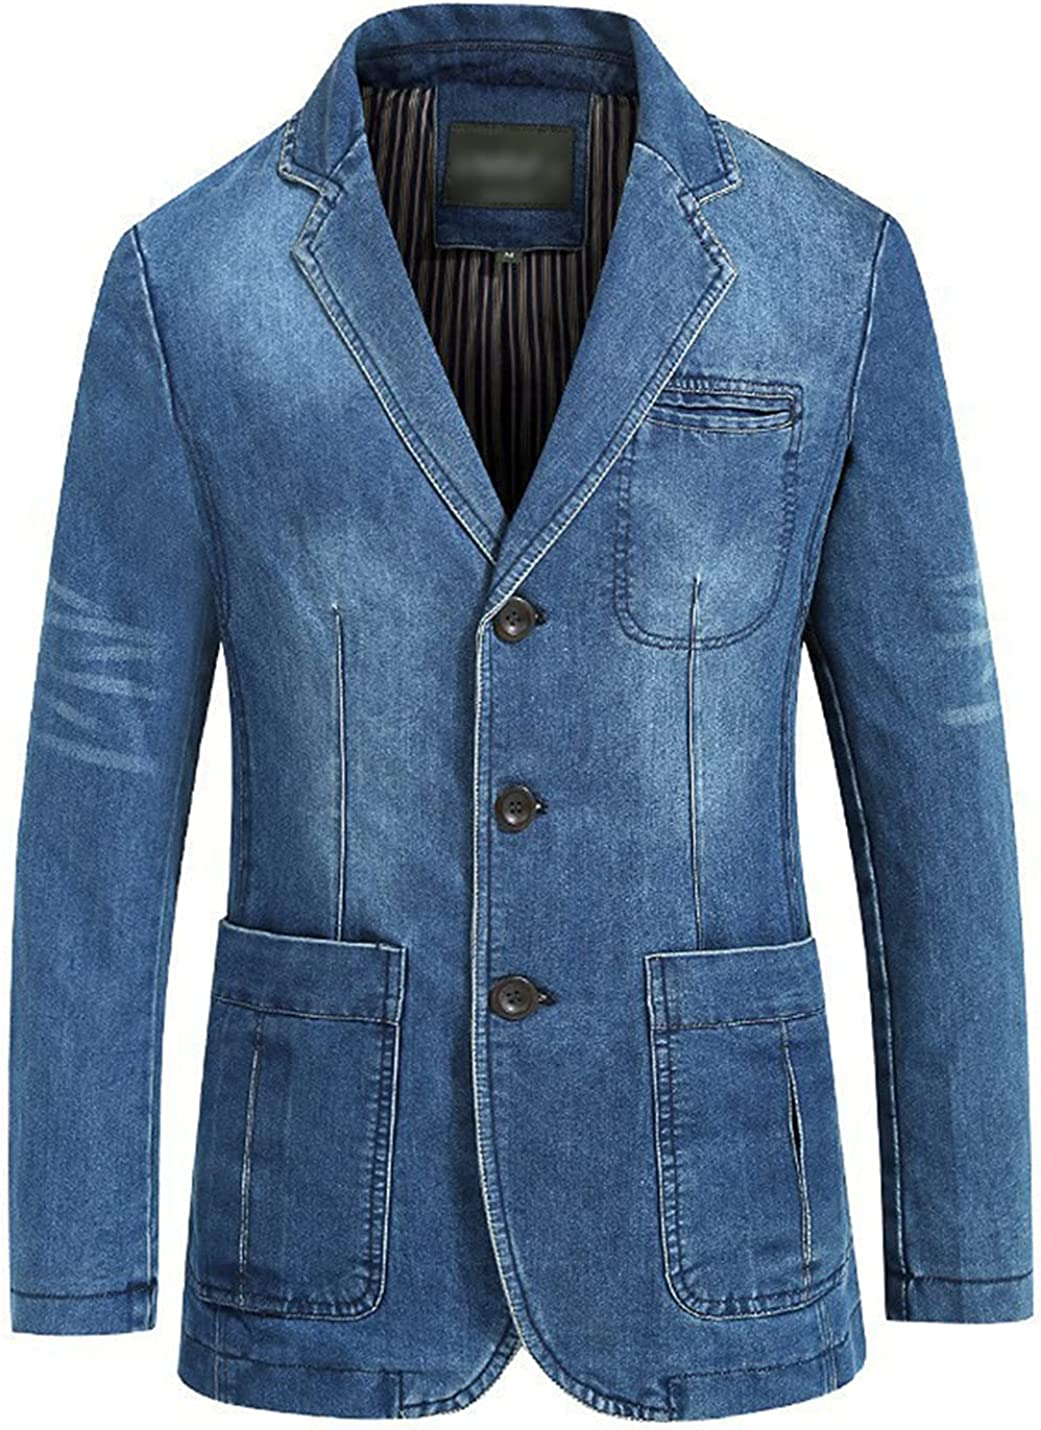 PEHMEA Men's Three Buttons Denim Blazer Jacket Vintage Notched Collar Sports Coats